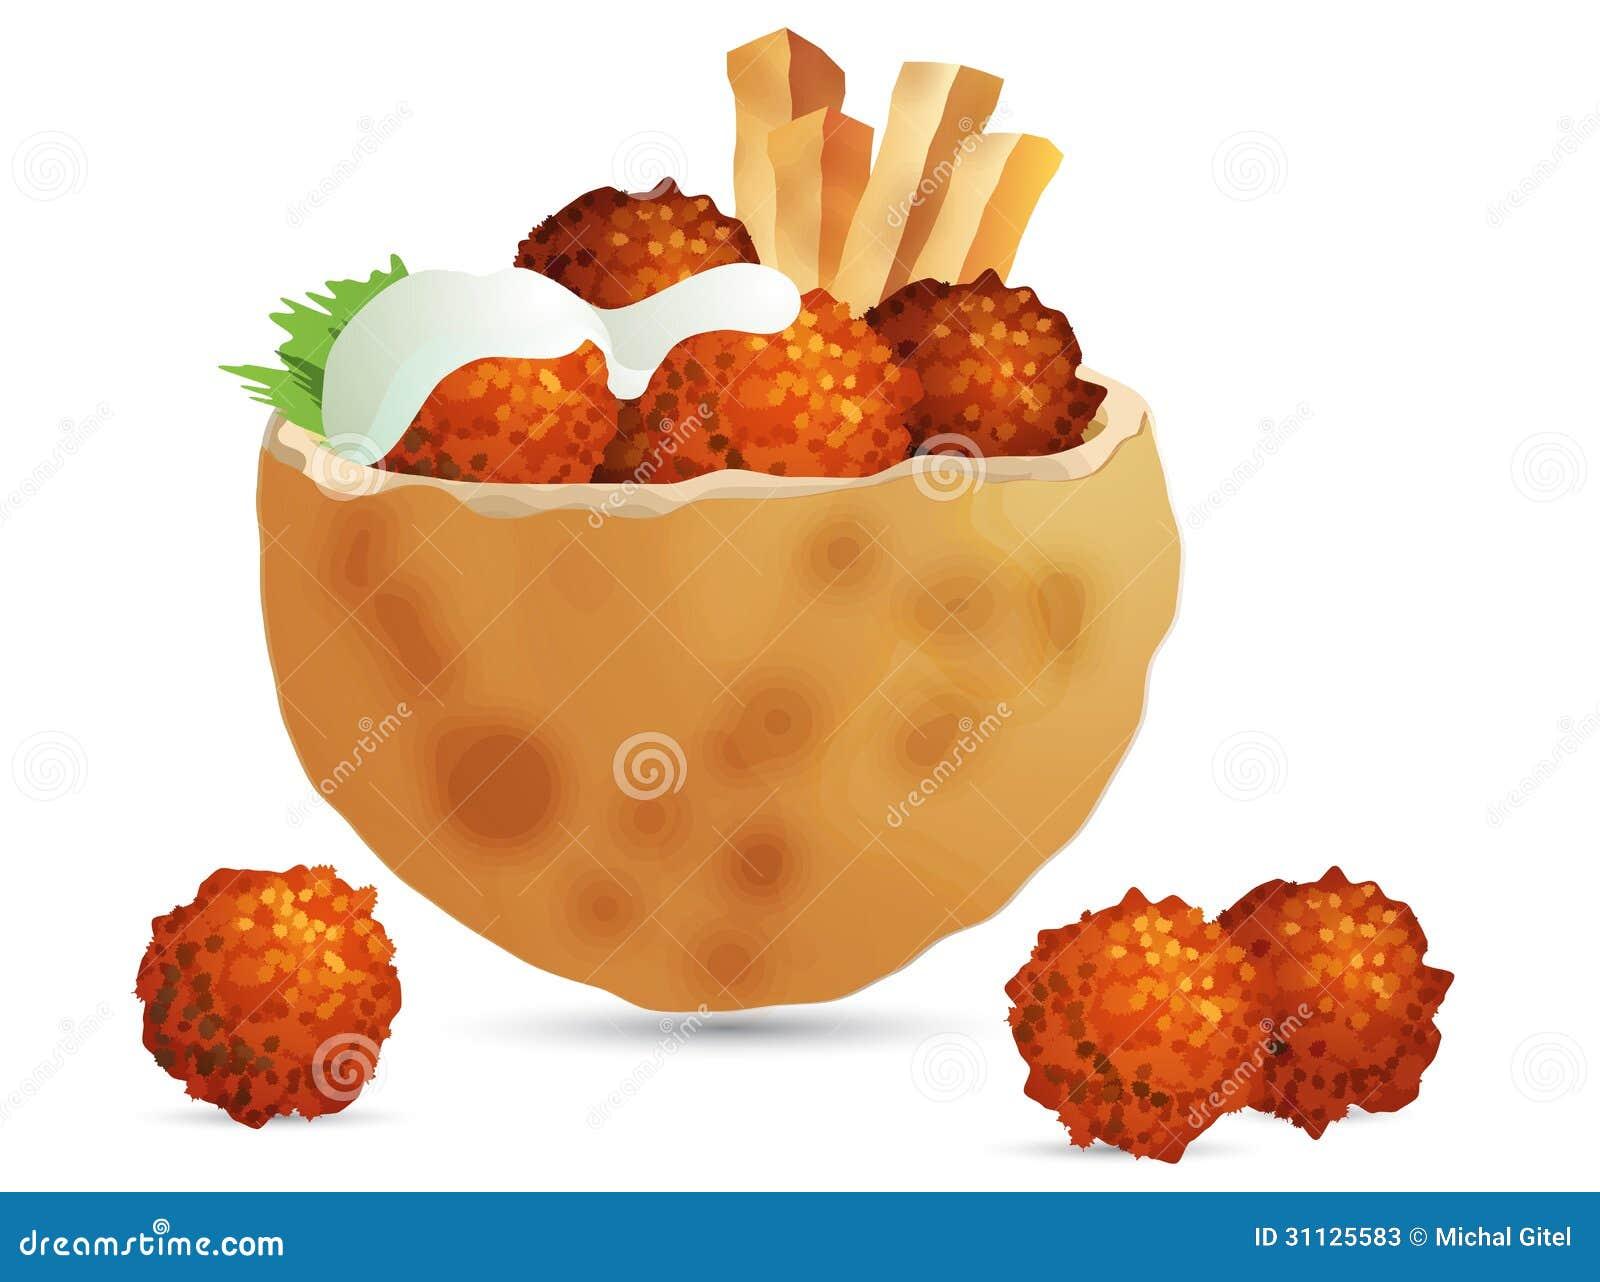 Falafel Stock Photos - Image: 31125583 Falafel Clipart